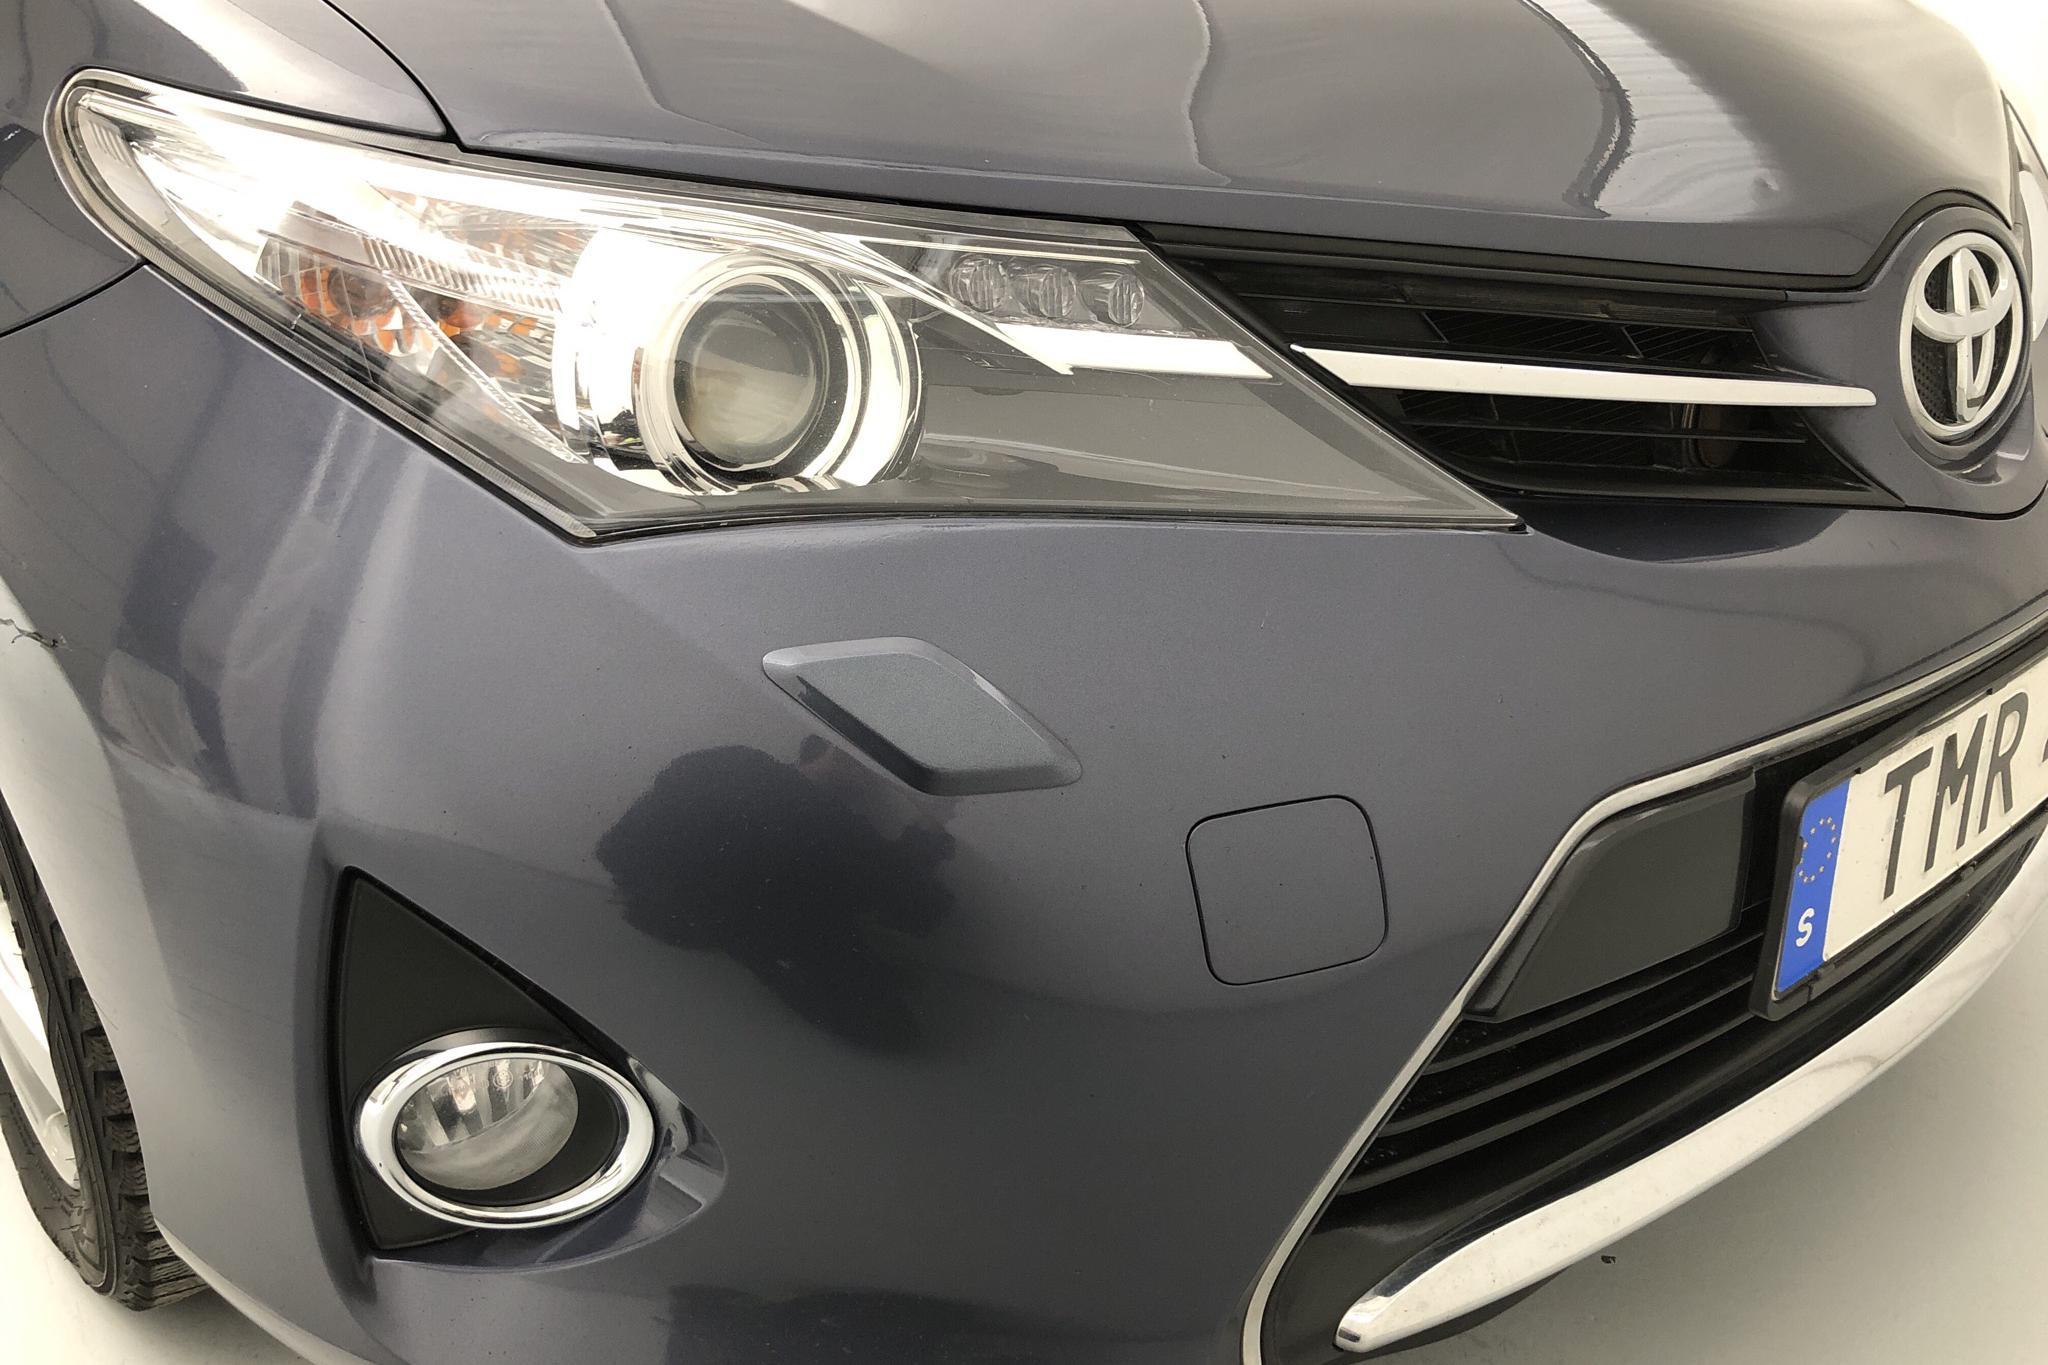 Toyota Auris 1.6 Valvematic 5dr (132hk) - 18 295 mil - Manuell - Dark Blue - 2015